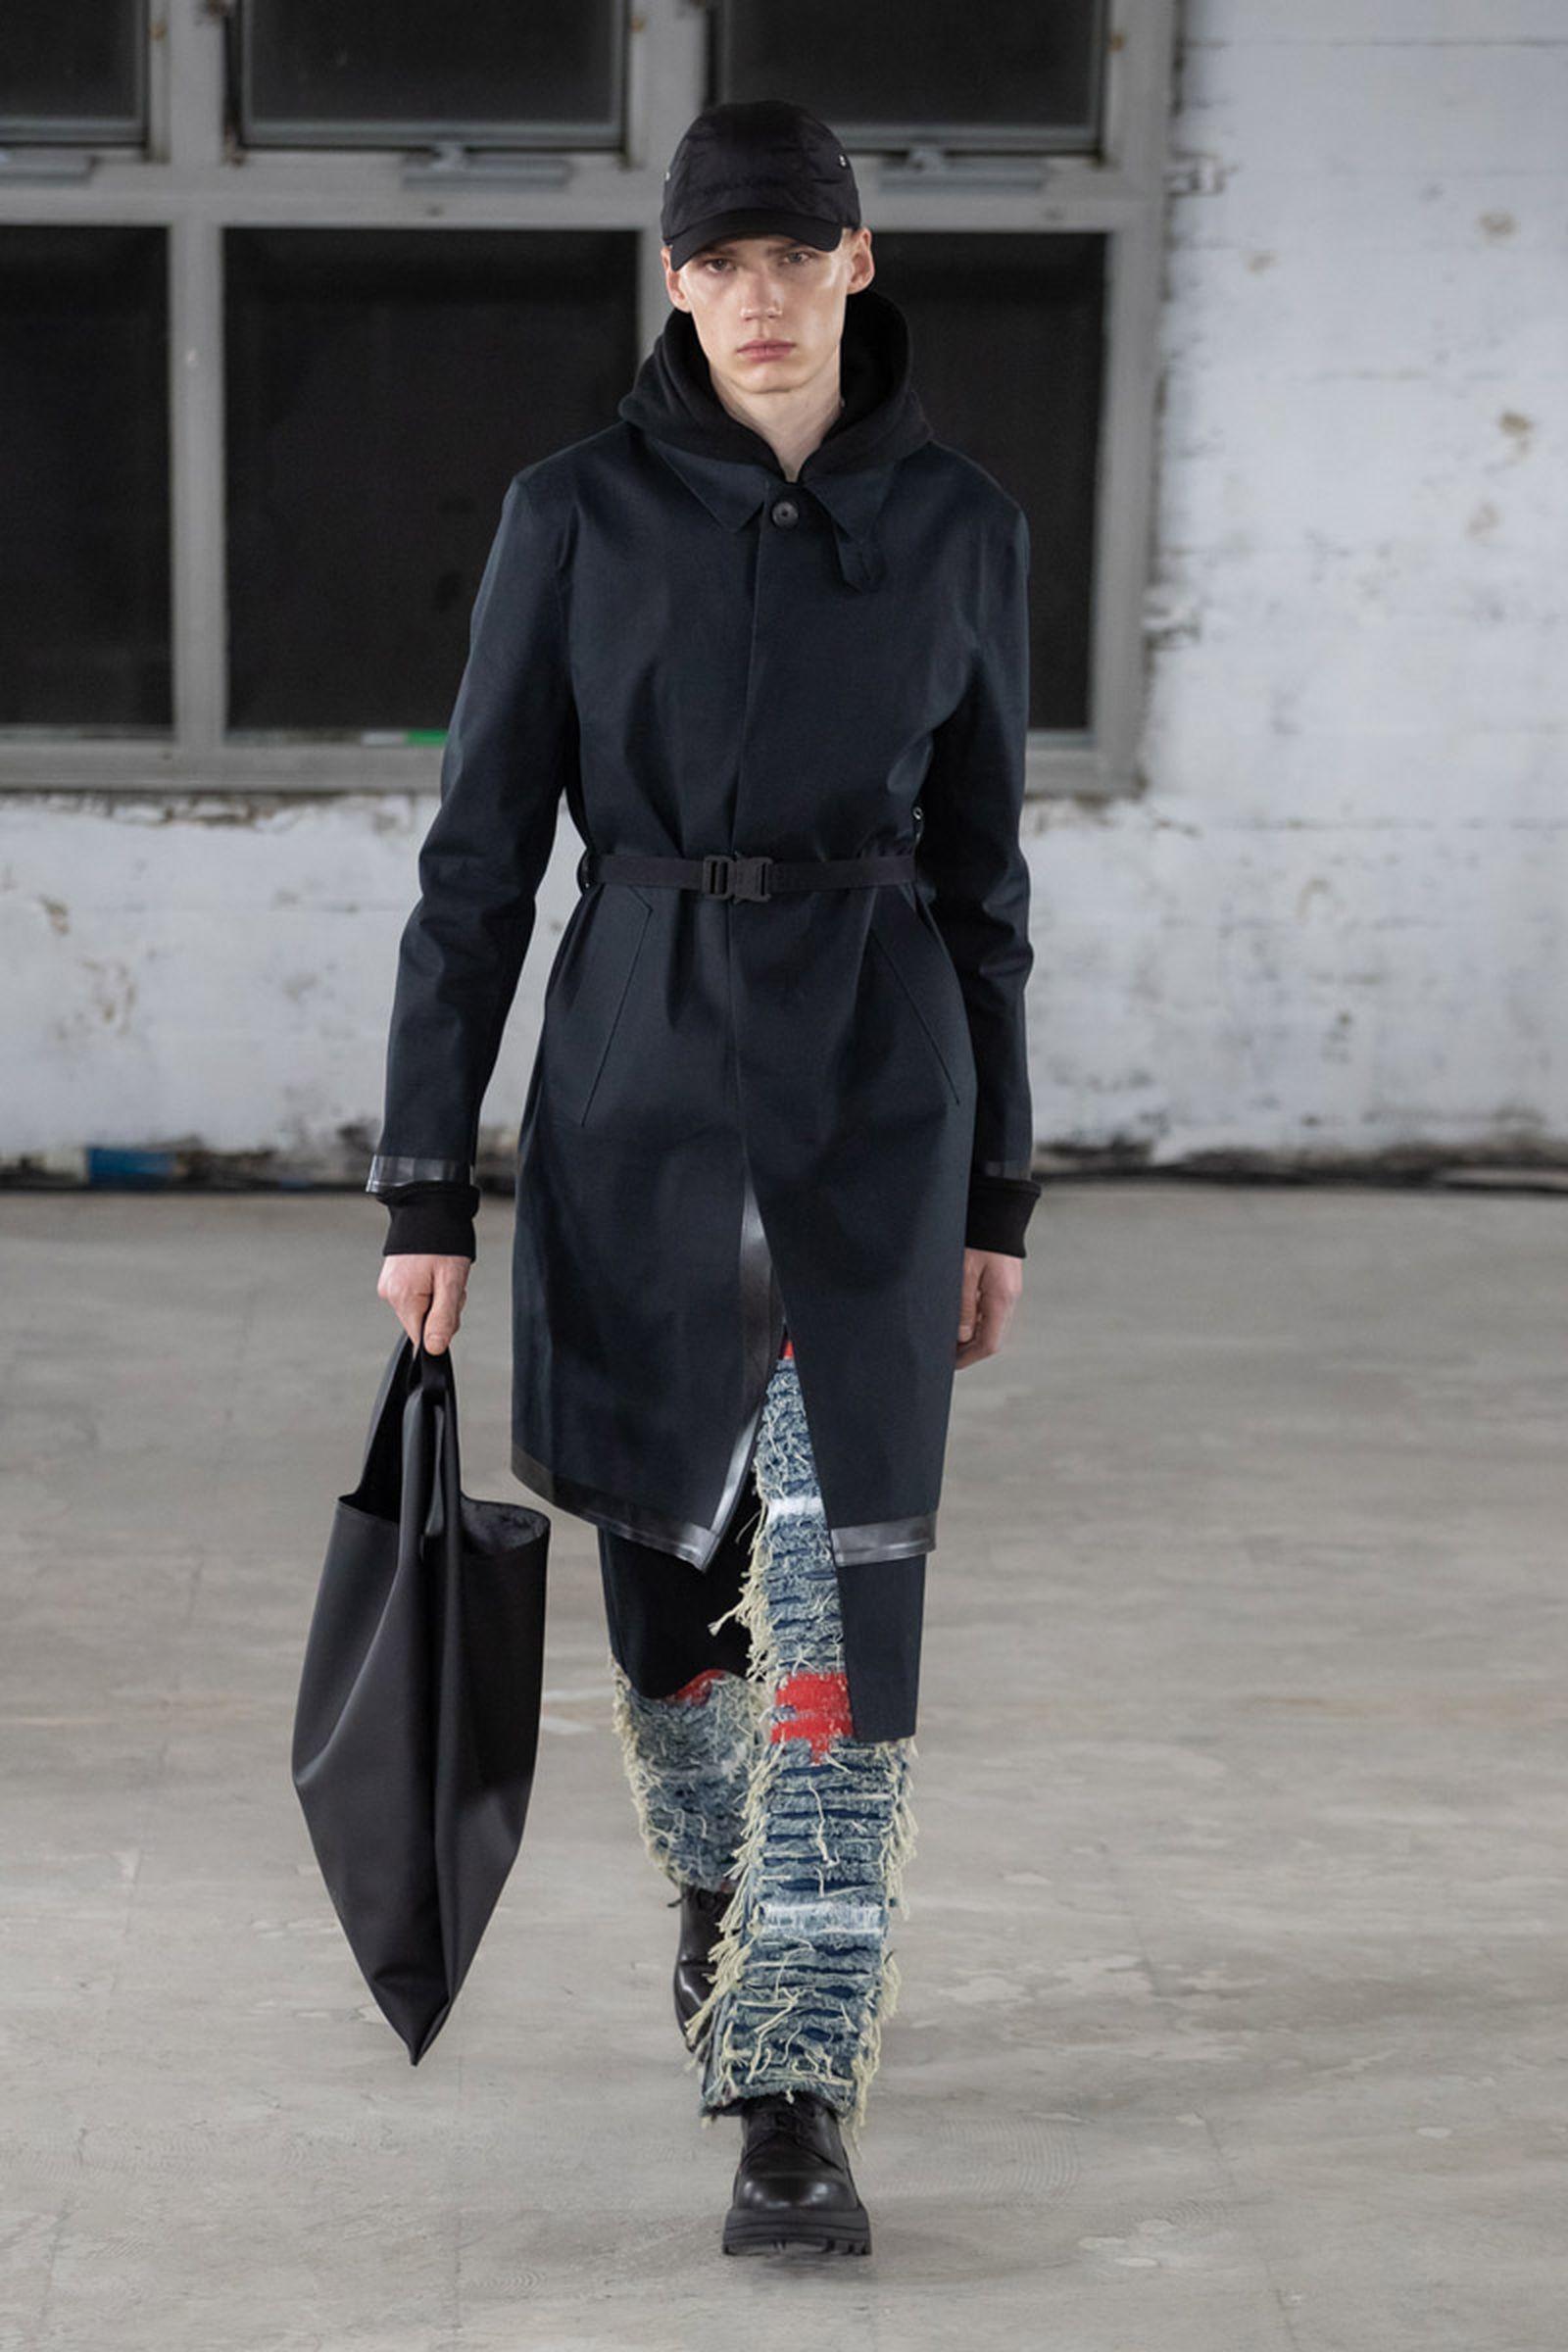 1017 ALYX 9SMFall Winter 2019Paris Fashion Week alyx studio matthew williams pfw19